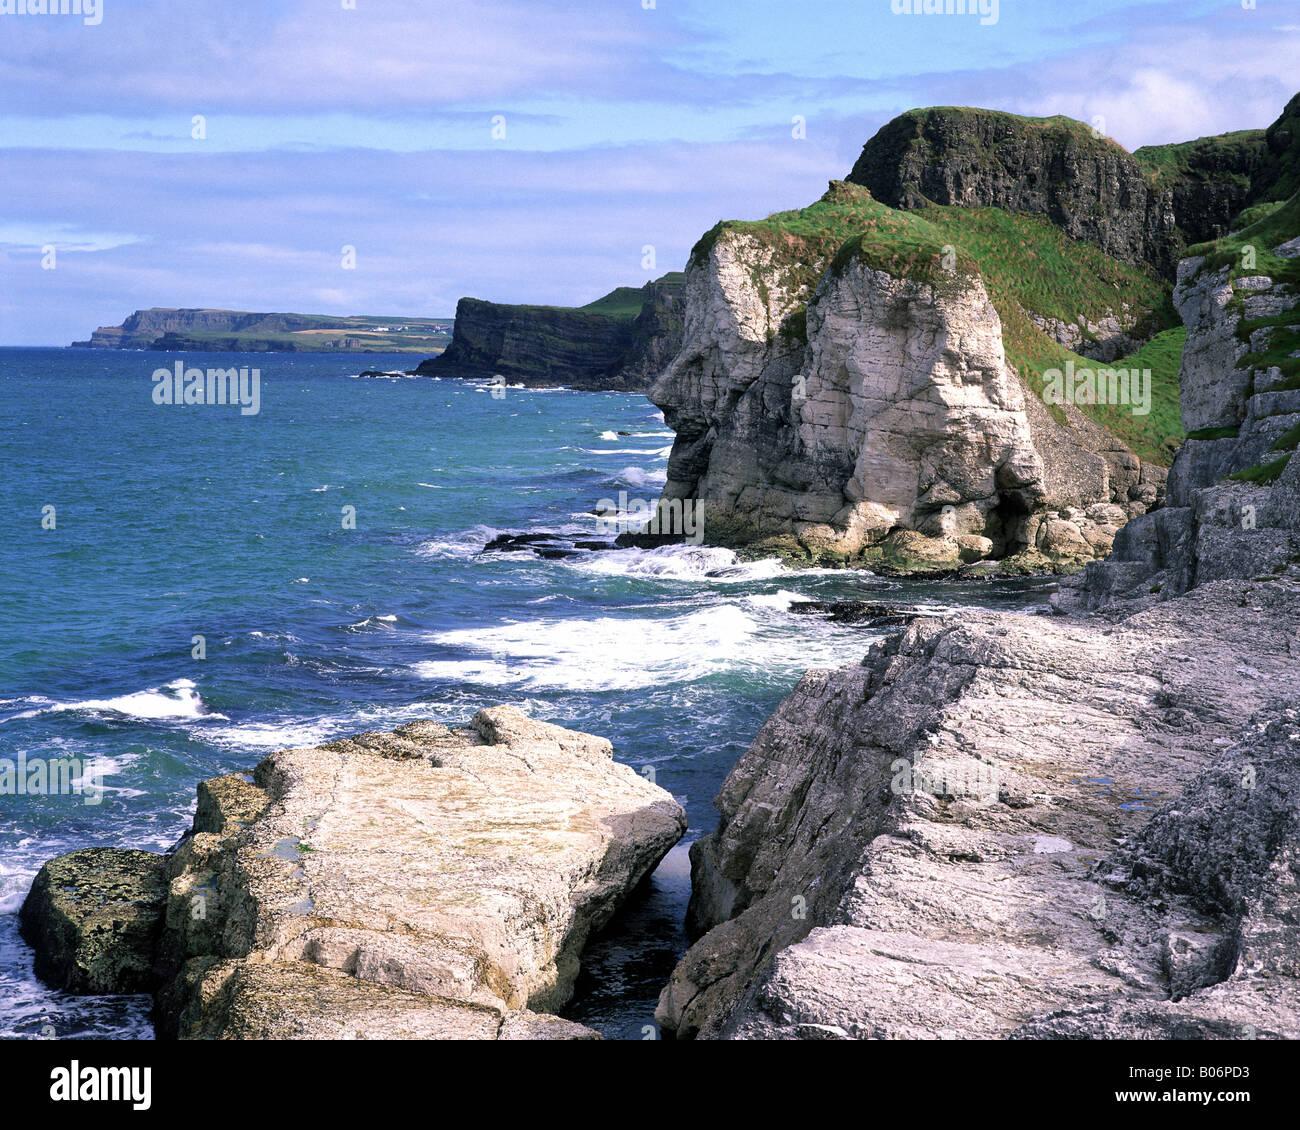 GB - NORTHERN IRELAND: Giants Head along Antrim Coast - Stock Image